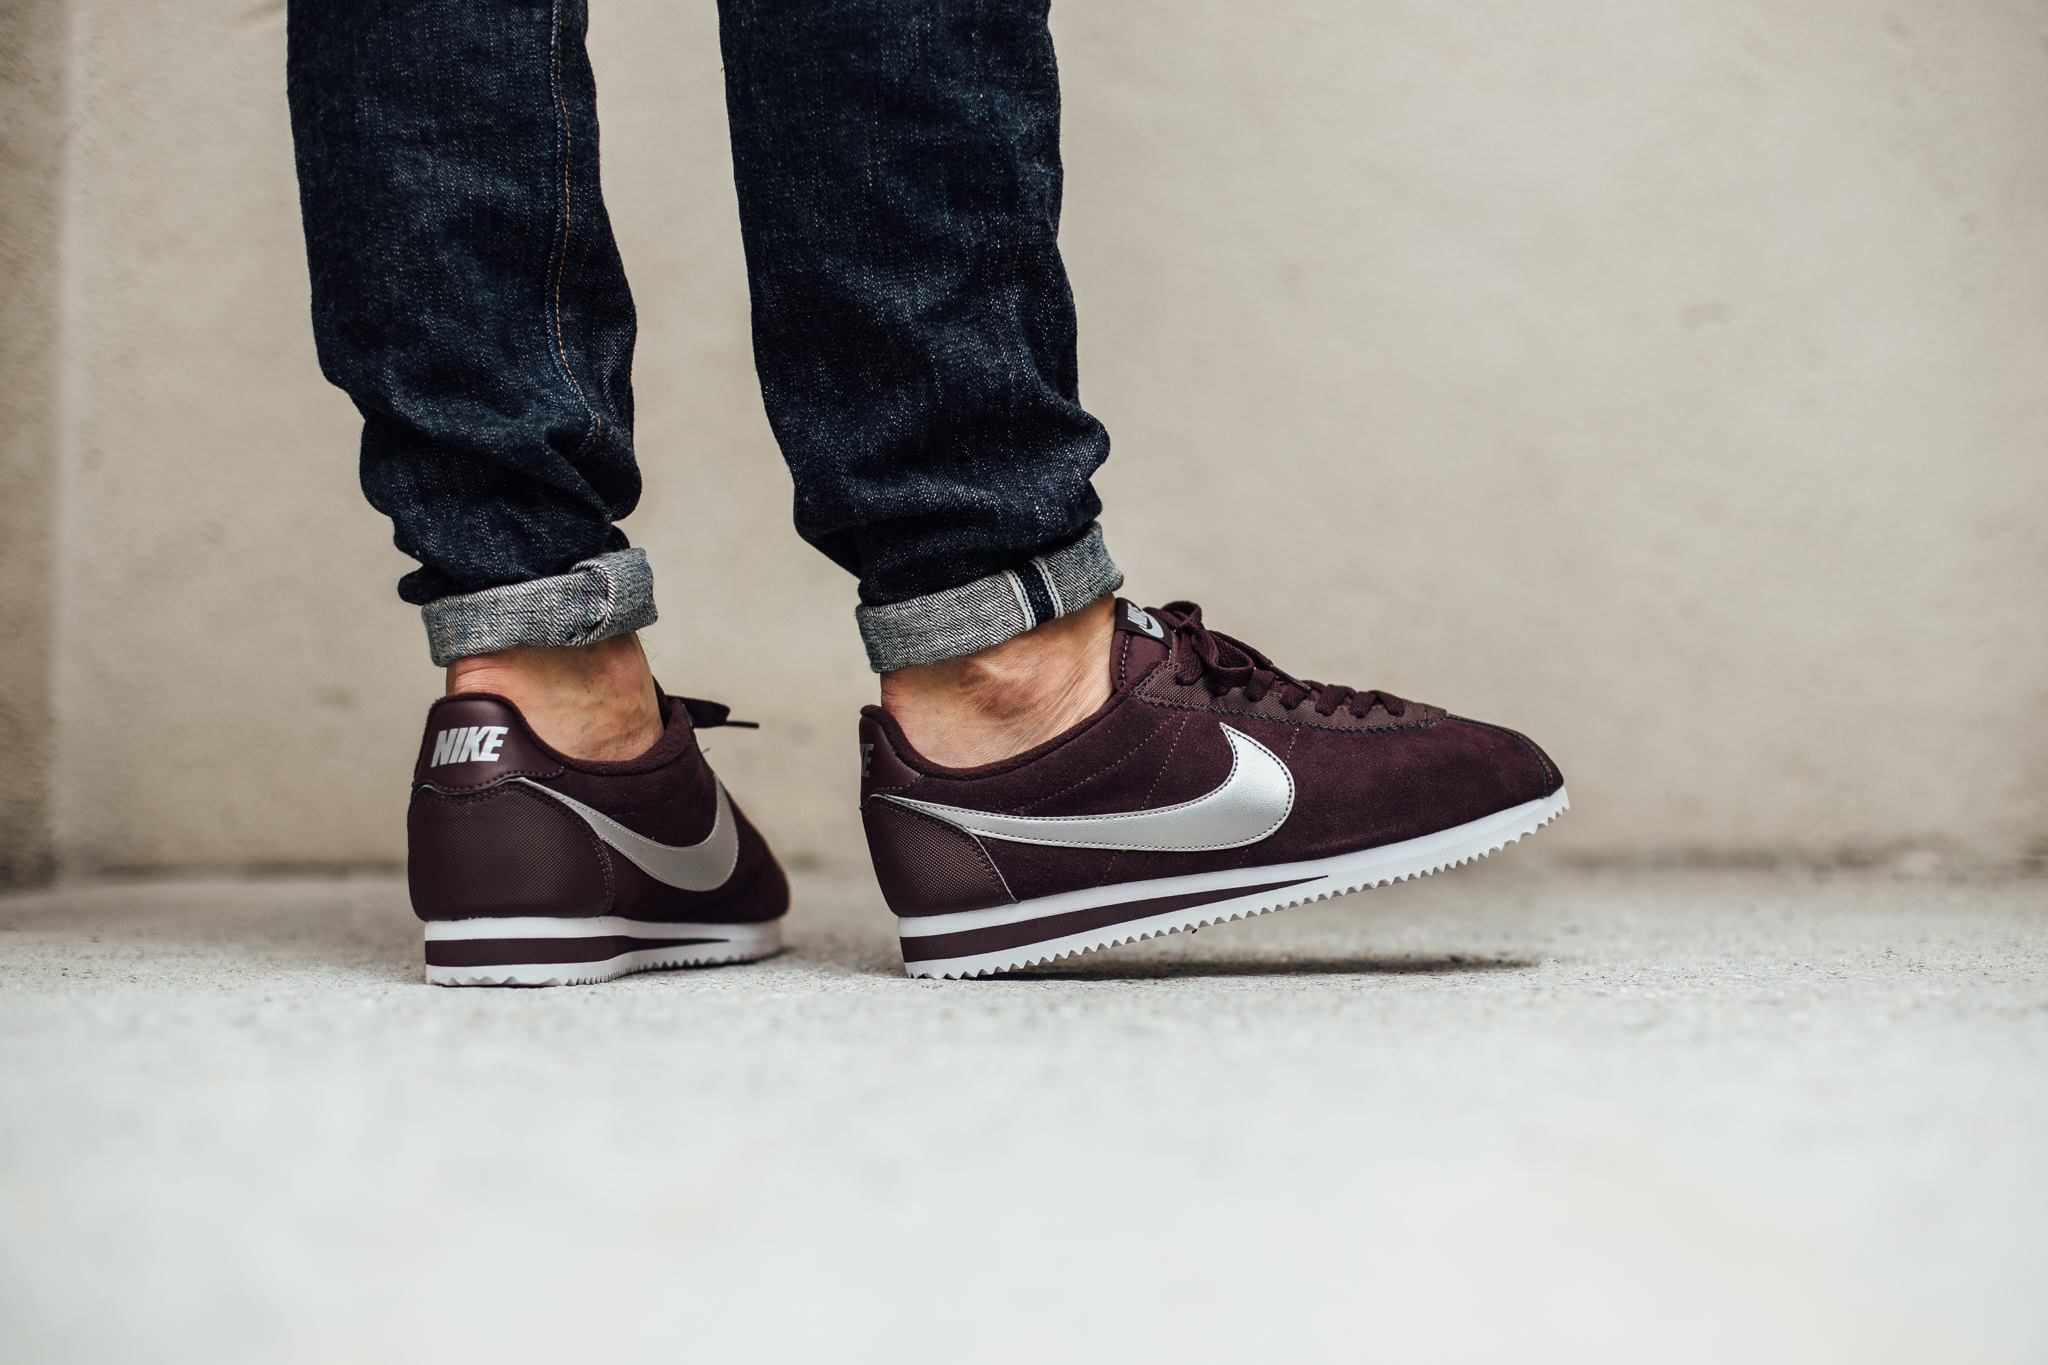 Nike Classic Cortez Leather Mahogany Metallic Silver White Nike Classic Cortez Leather Retro Sneakers Fresh Shoes